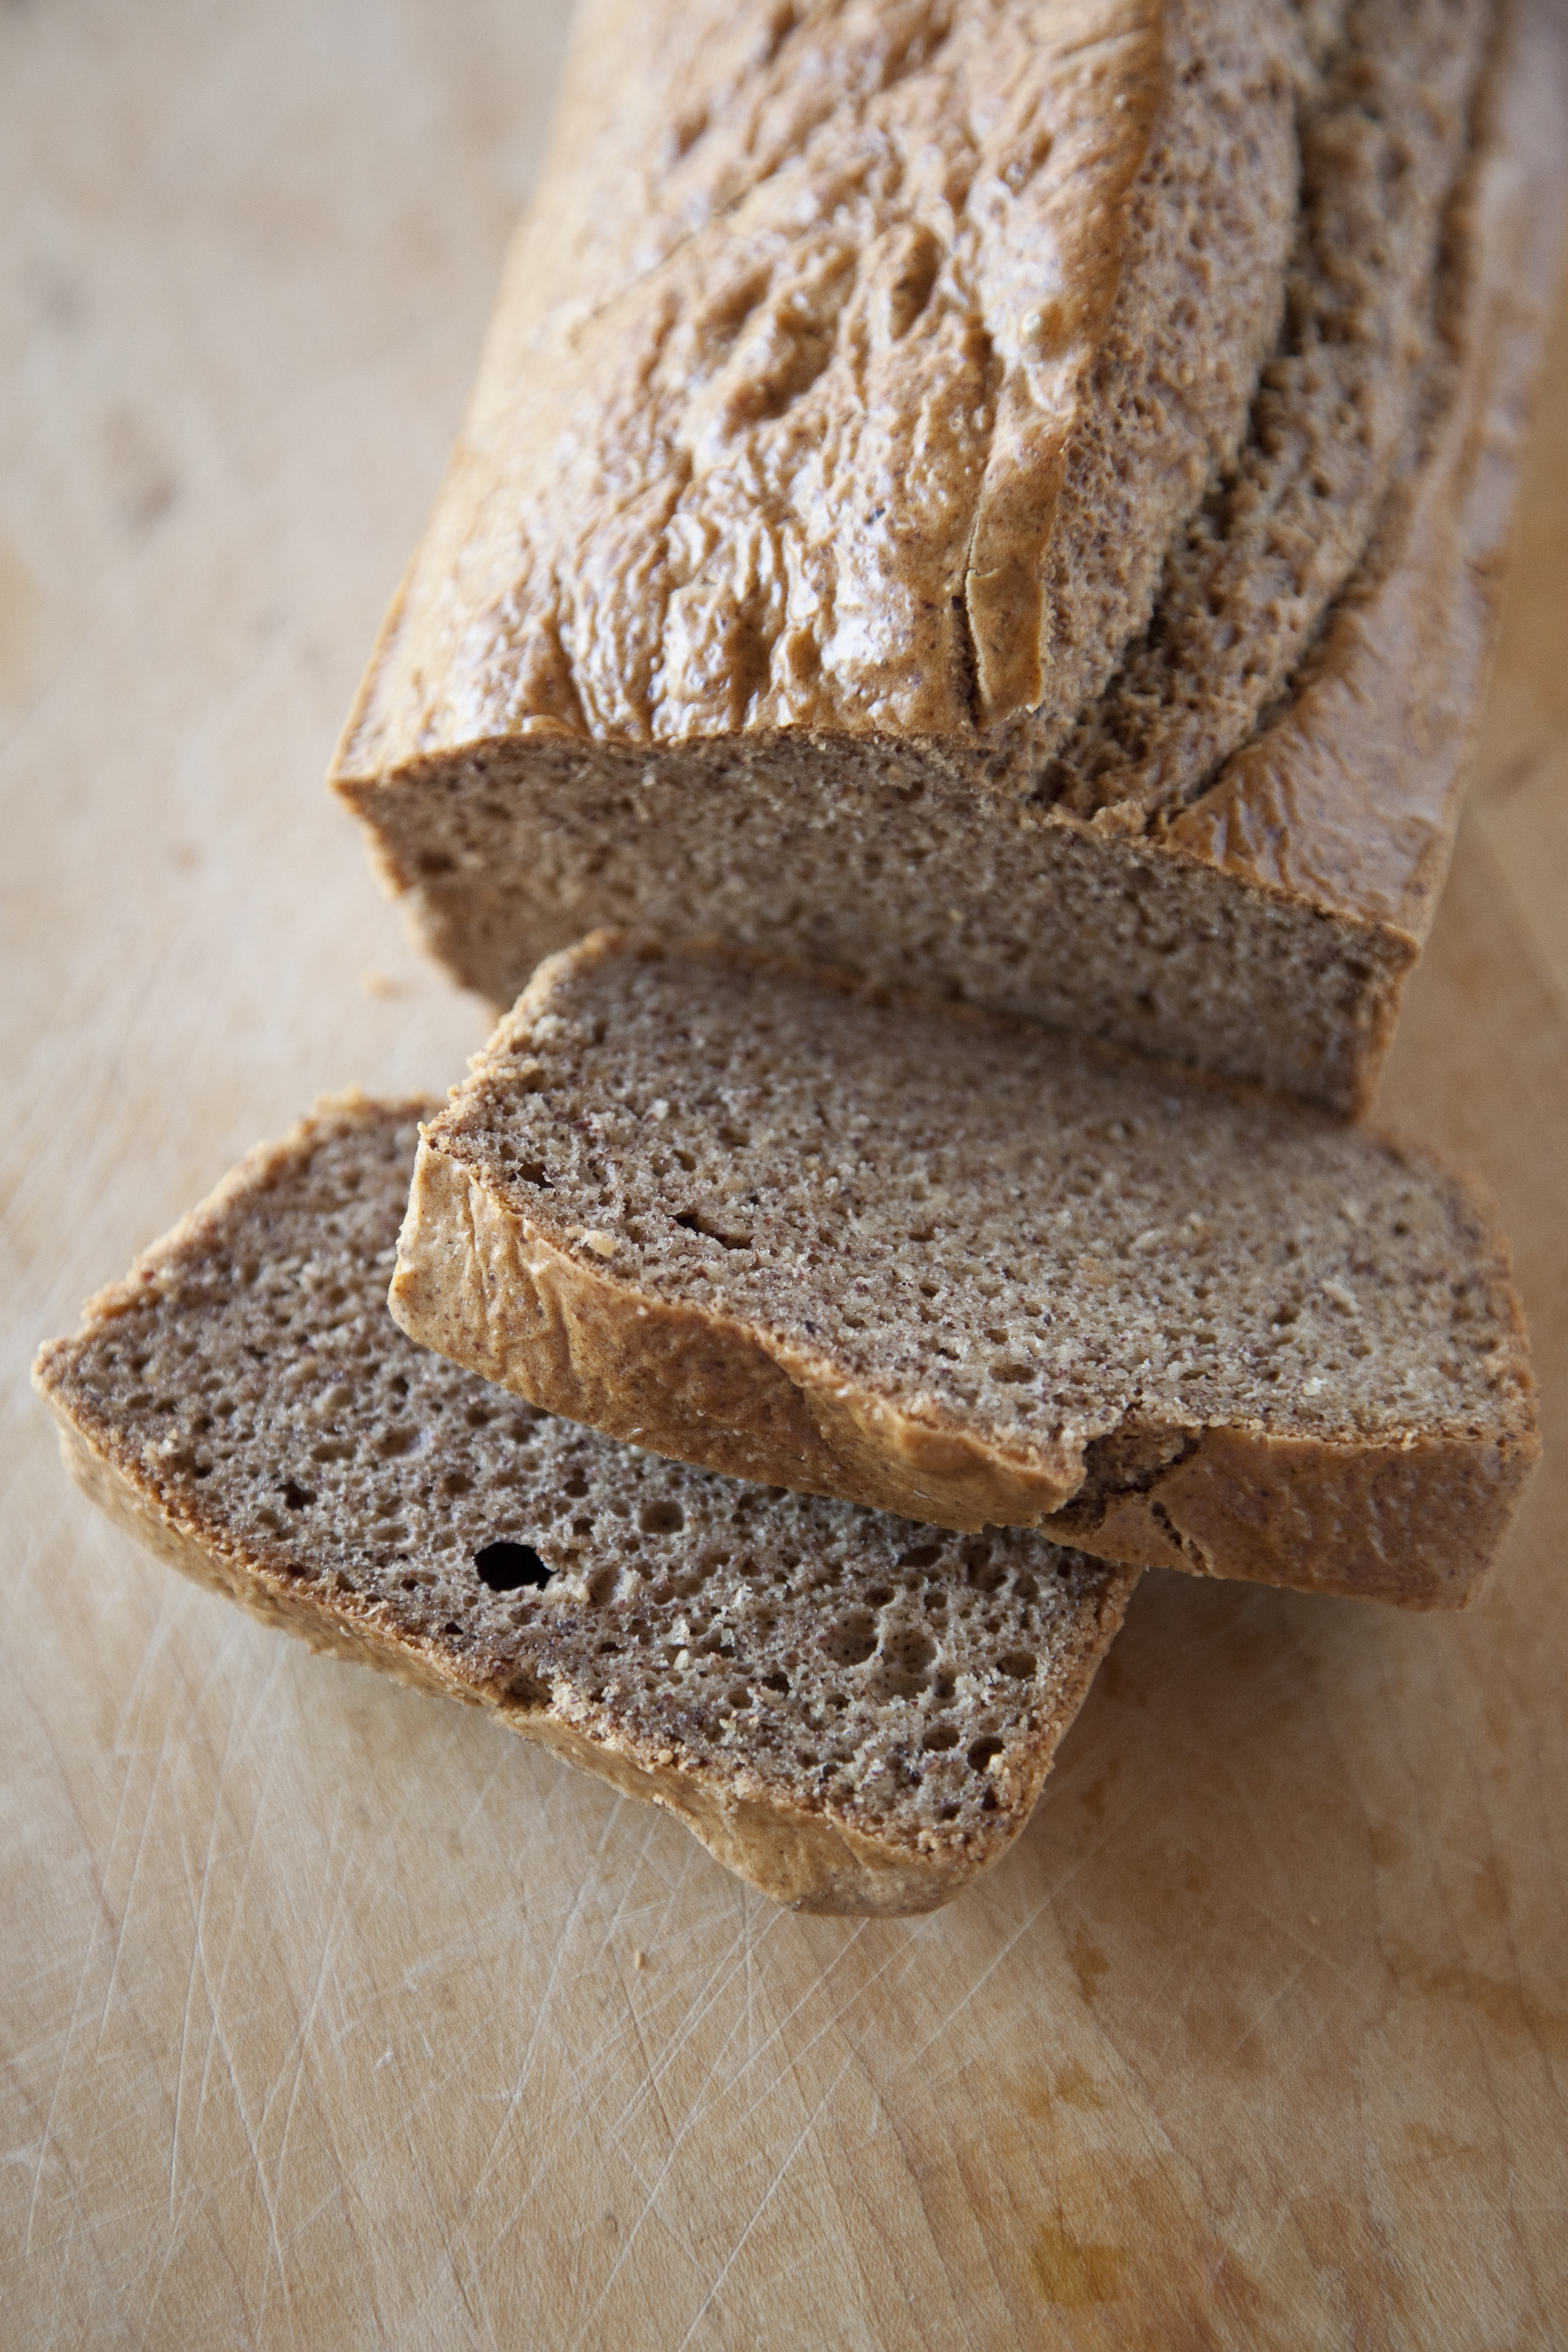 cooking caveman's 4 ingredient bread